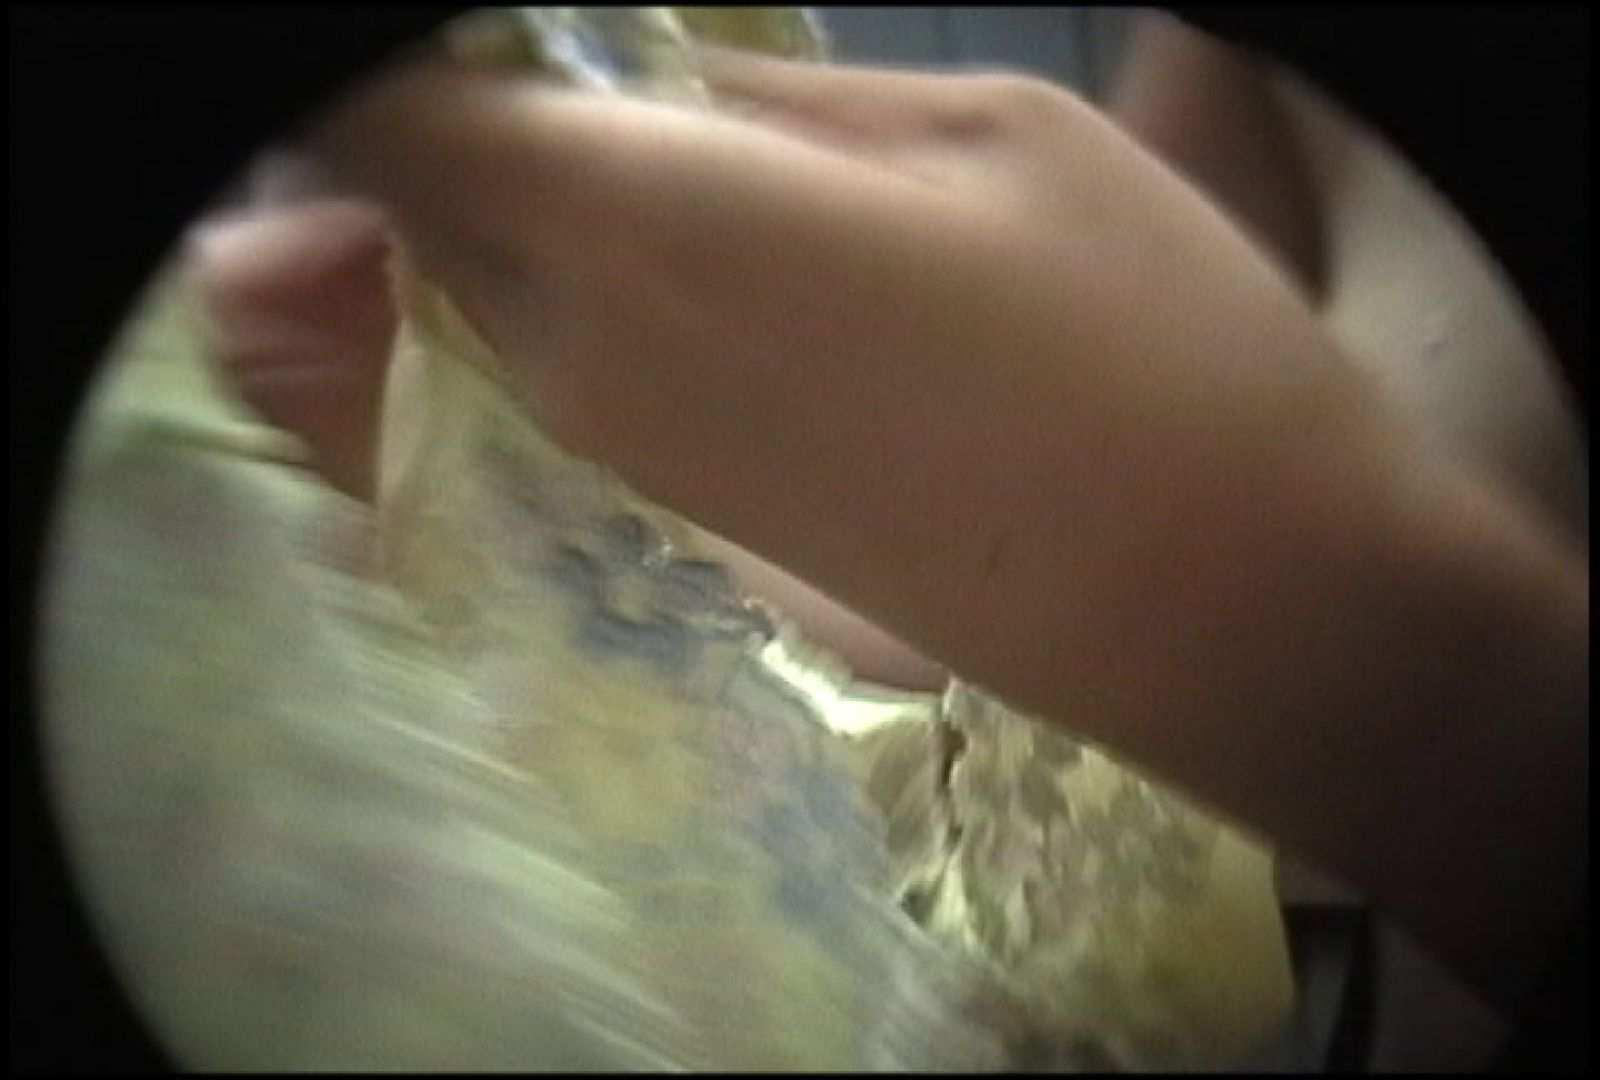 No.134 年増のぽっこりお腹 乙女のボディ 盗撮動画紹介 103PIX 98